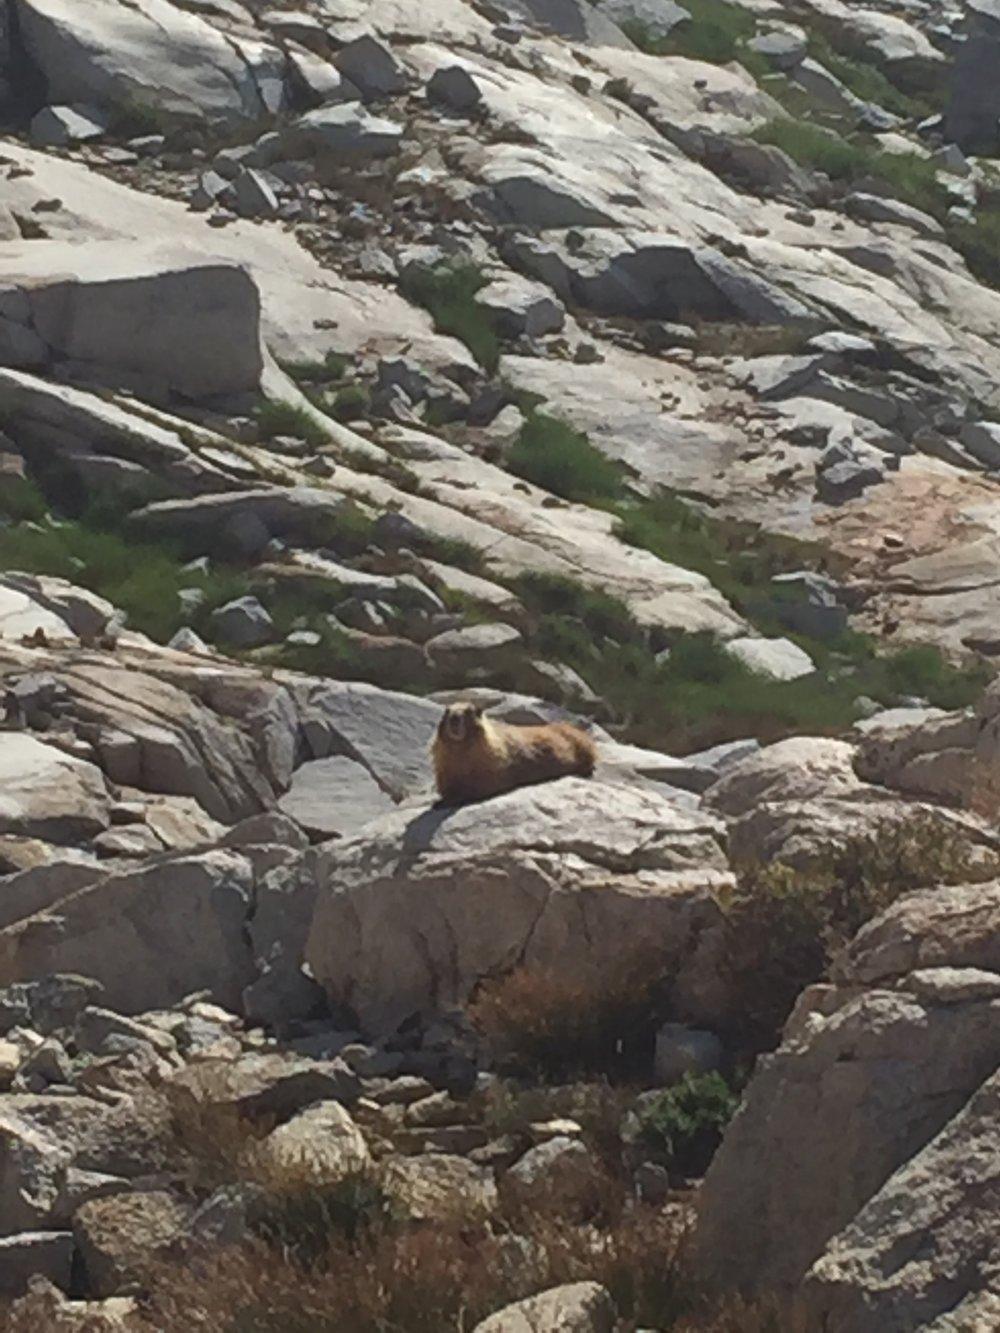 Speaking of marmots...